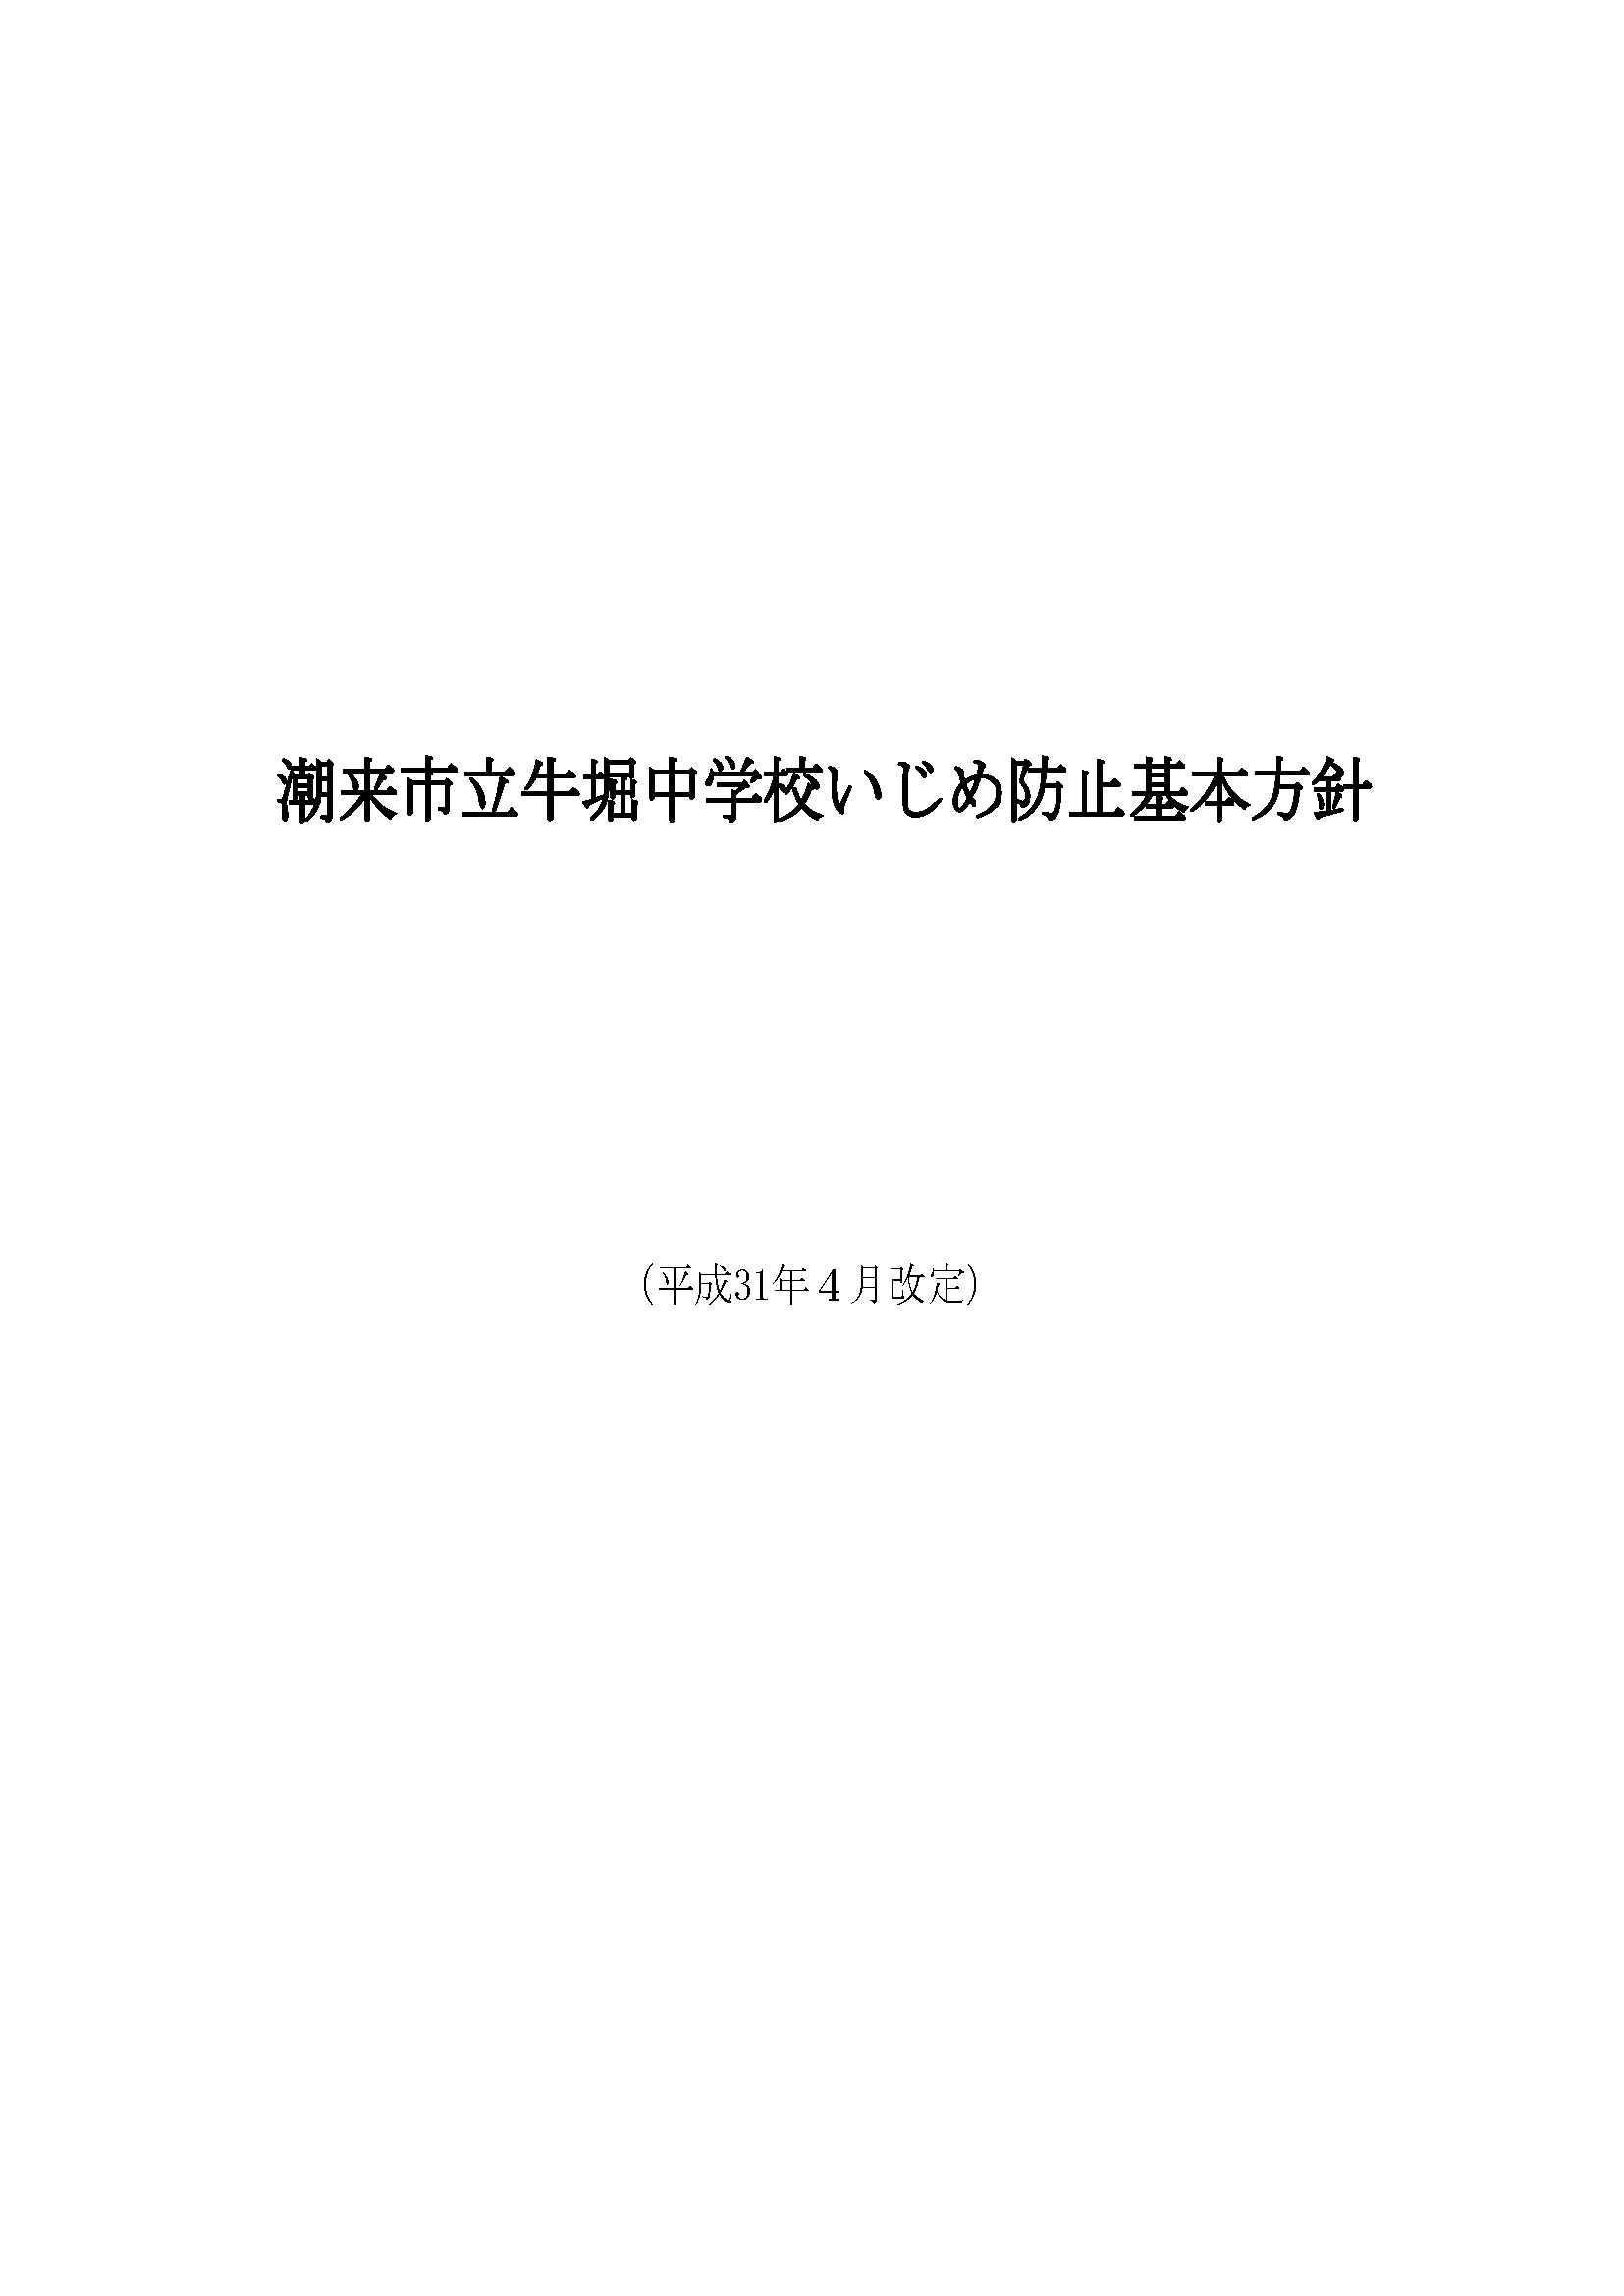 H31潮来市立牛堀中学校いじめ防止基本方針(H31改訂)_1